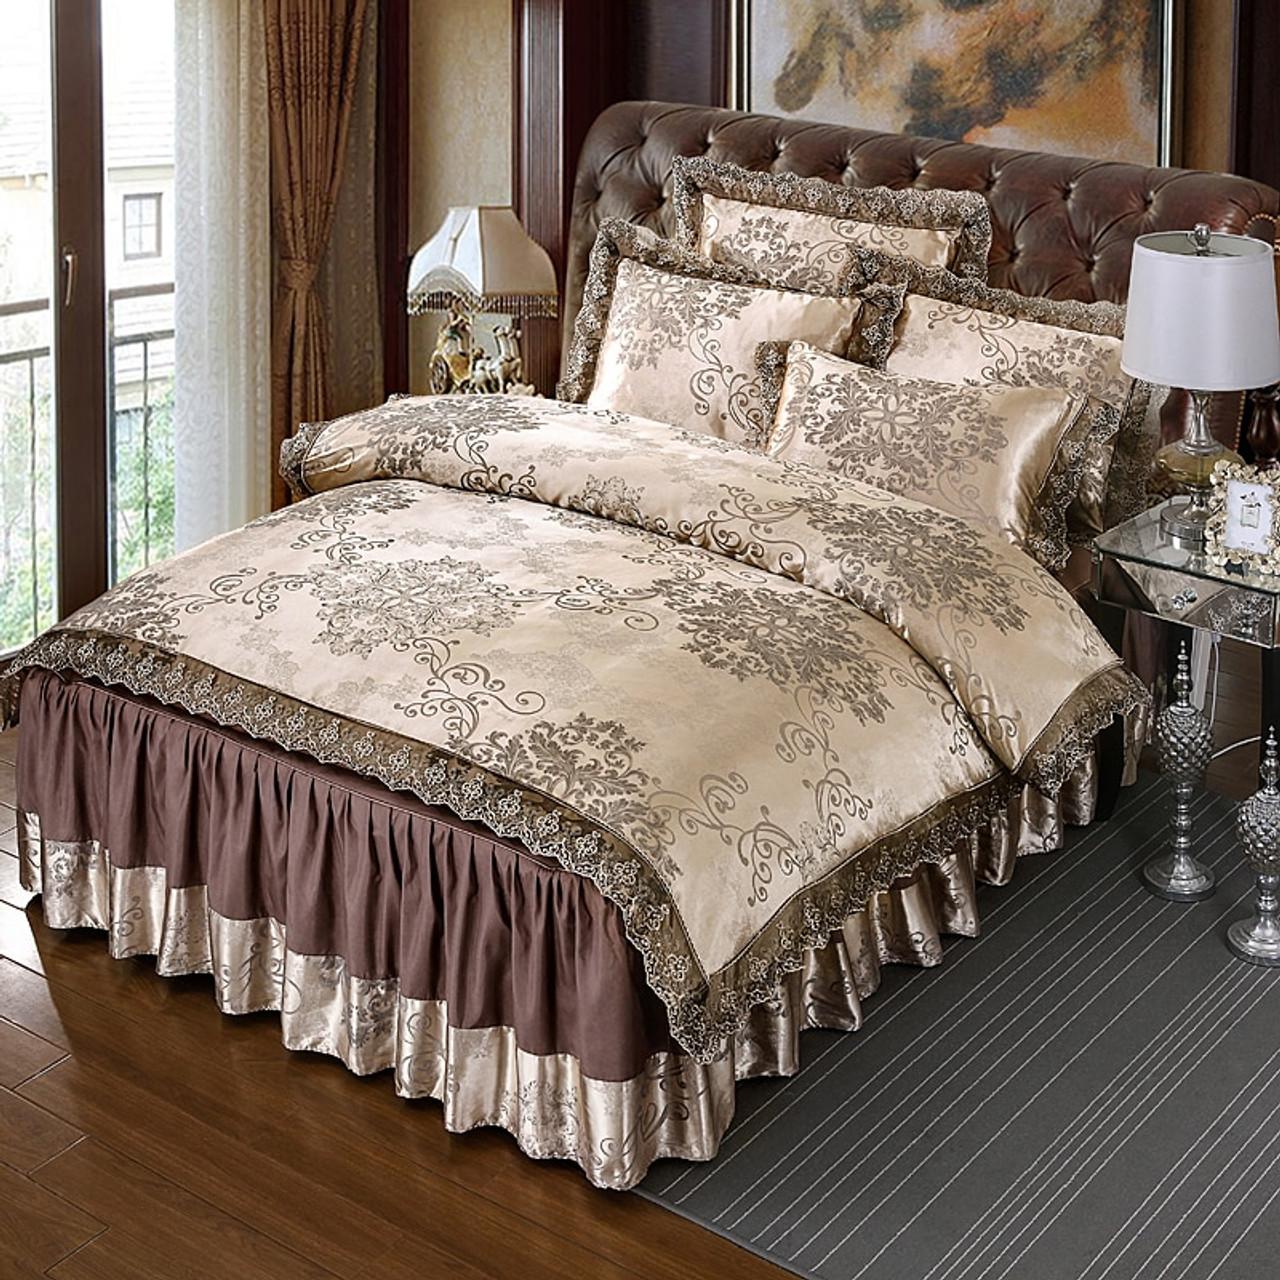 4pcs Satin Jacquard Luxury Lace Bedding Sets Queen King Size Duvet Cover Set Bed Skirt Set Pillowcase Bedclothes Onshopdeals Com